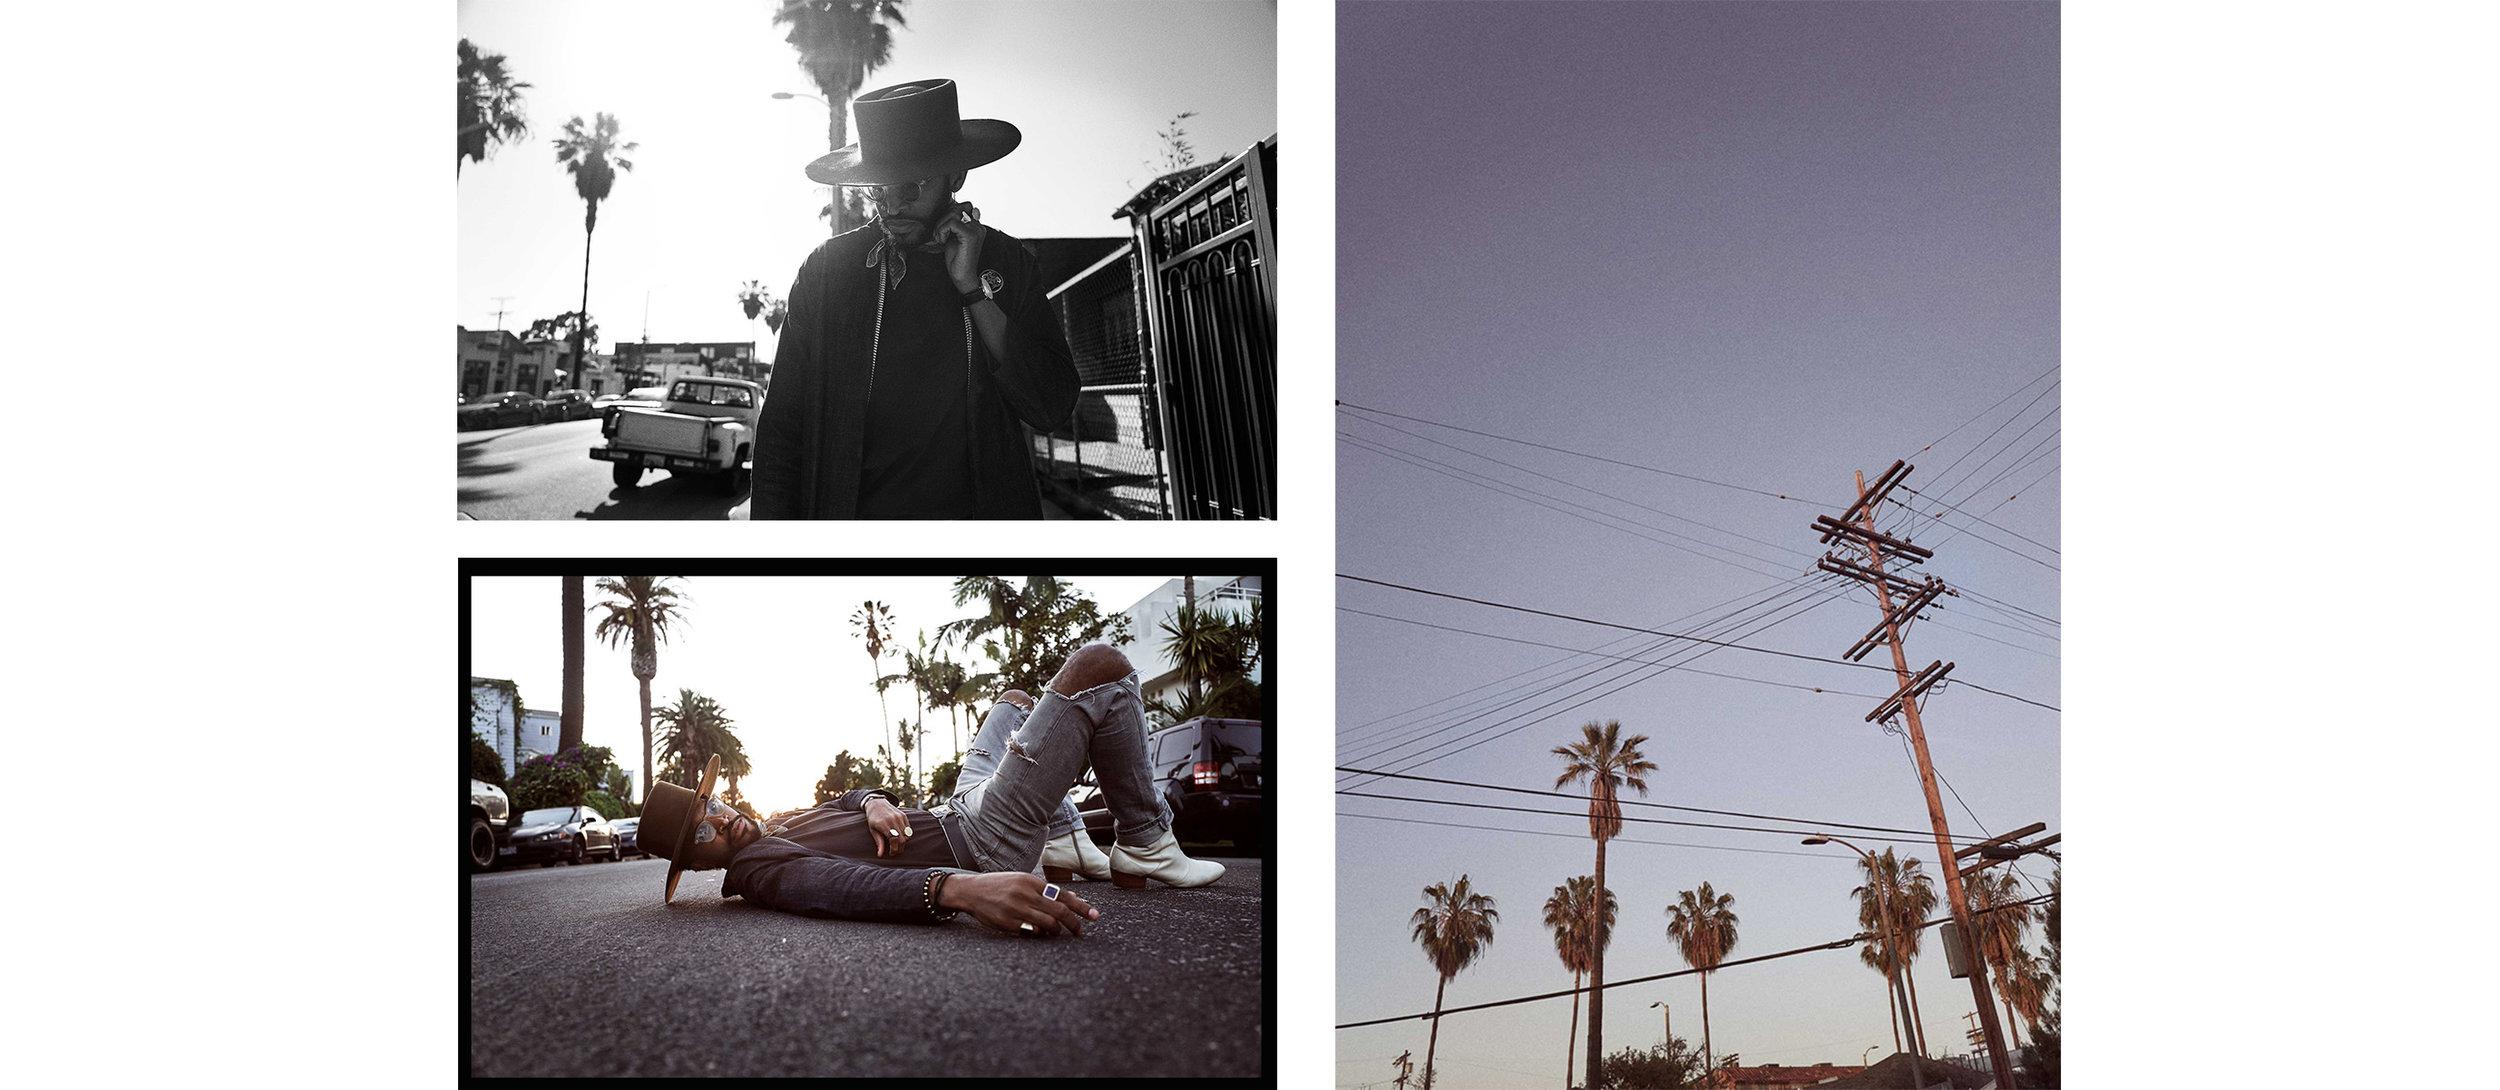 michael-scott-slosar-emmett-skyy-la-street-stories-13.jpg